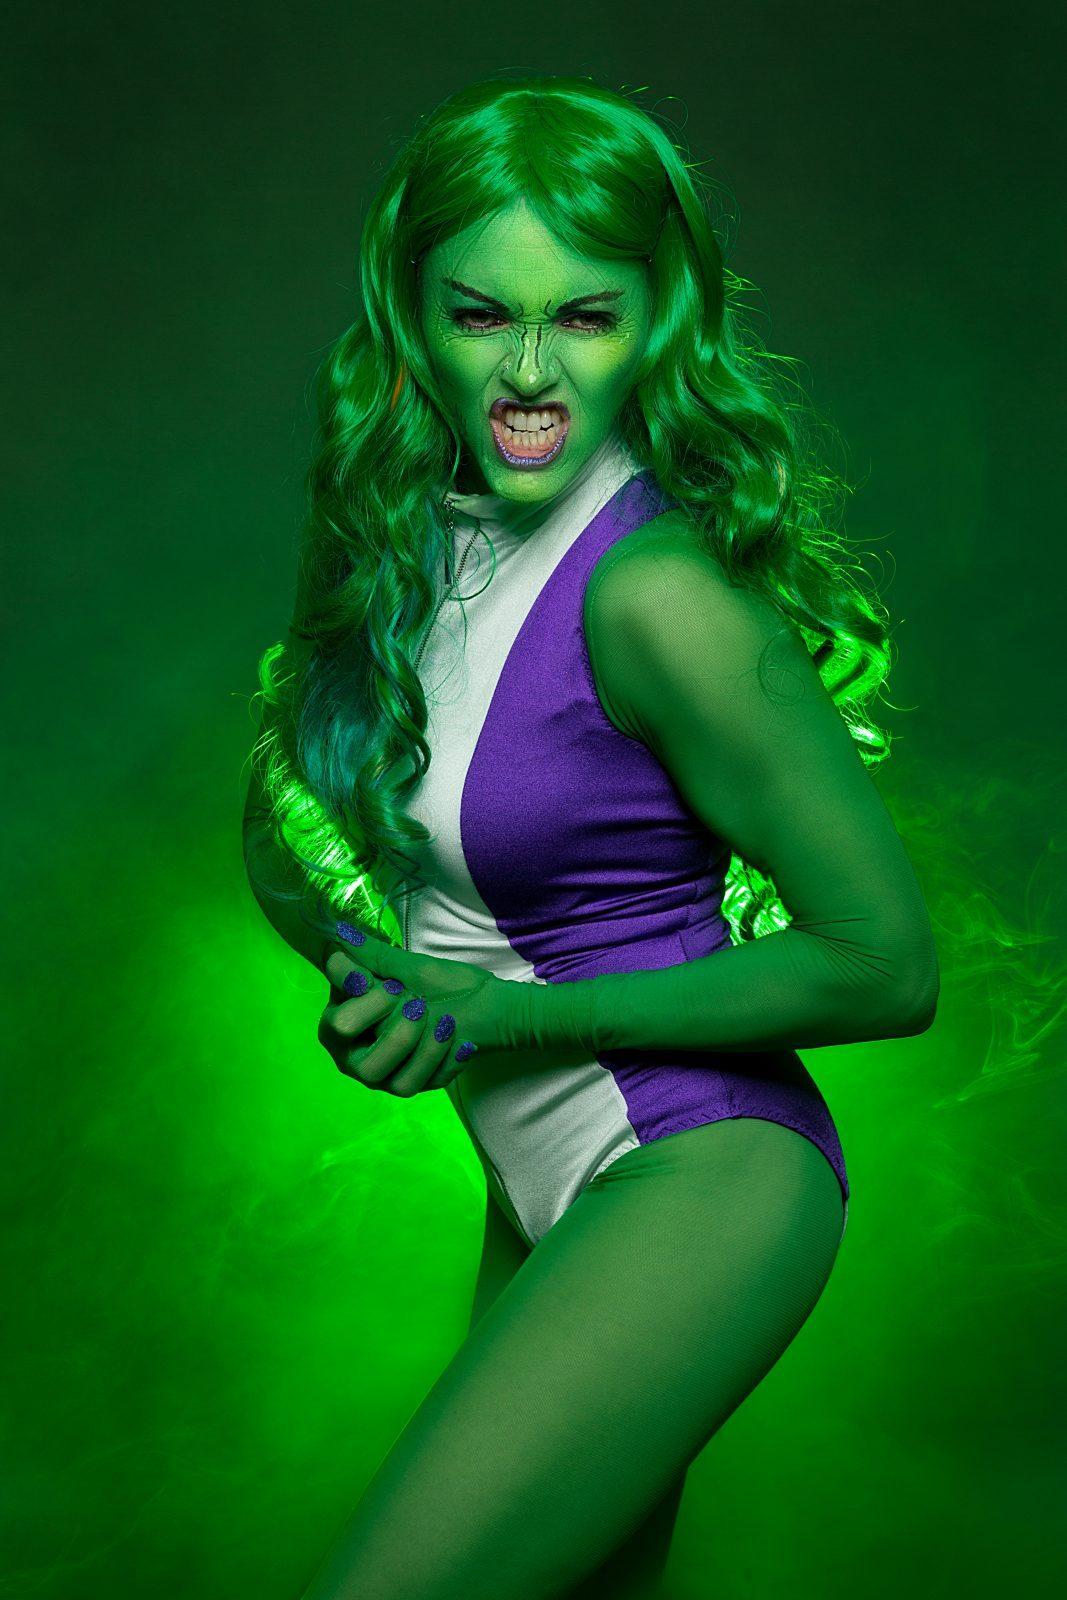 She-Hulk Leotard made with Lycra Fabric